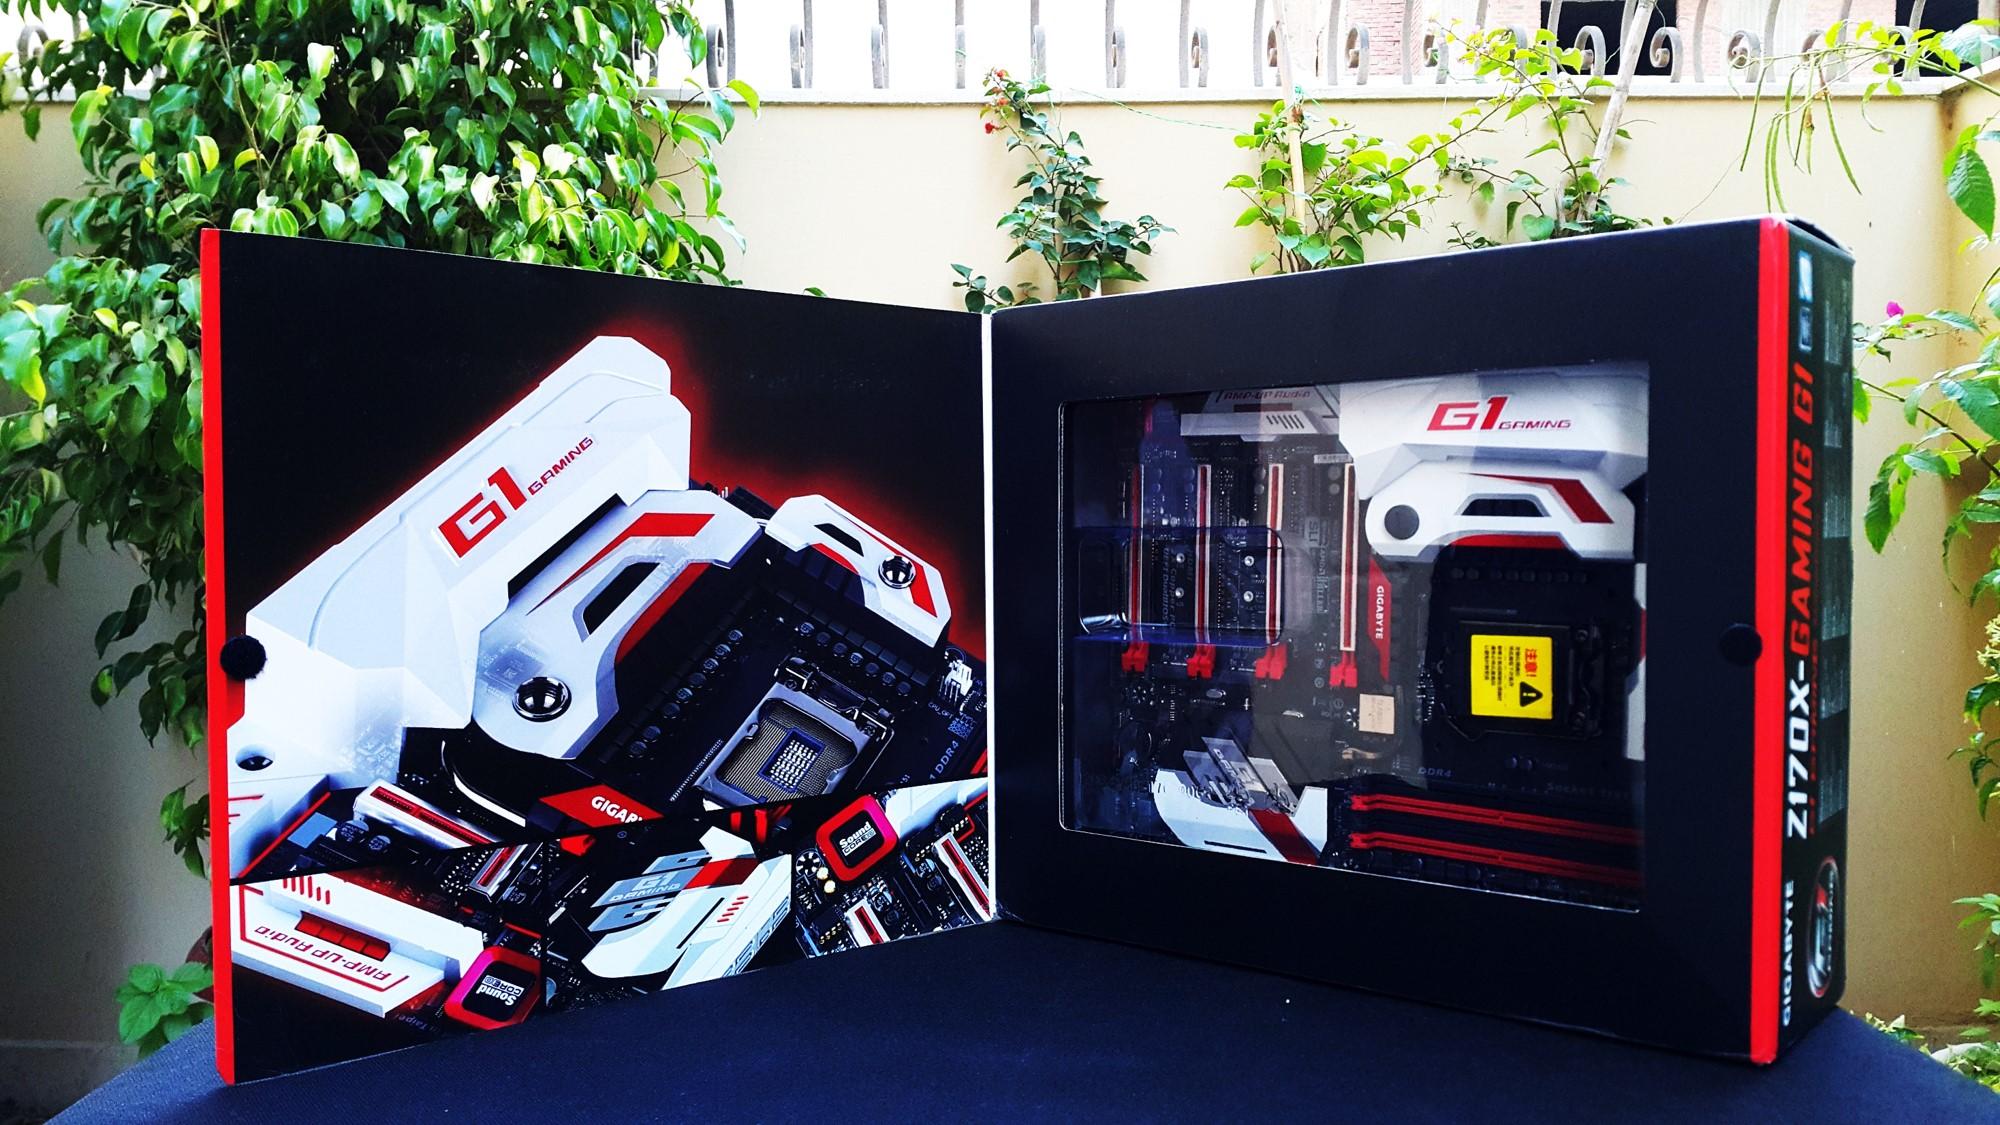 Gigabyte Z170X Gaming G1 Box open